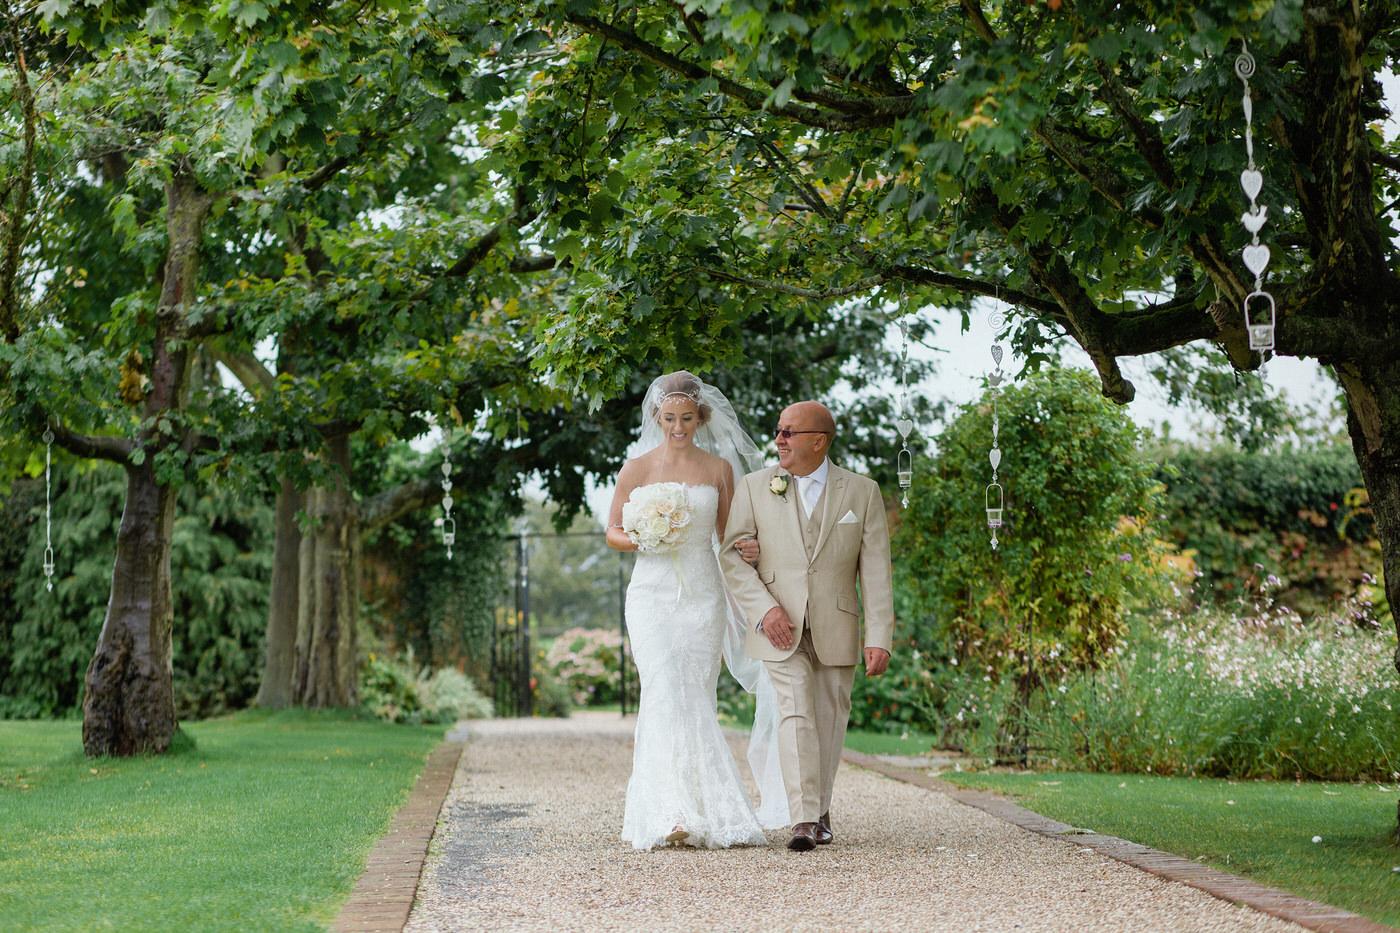 gaynes-park-wedding-photography-12.JPG